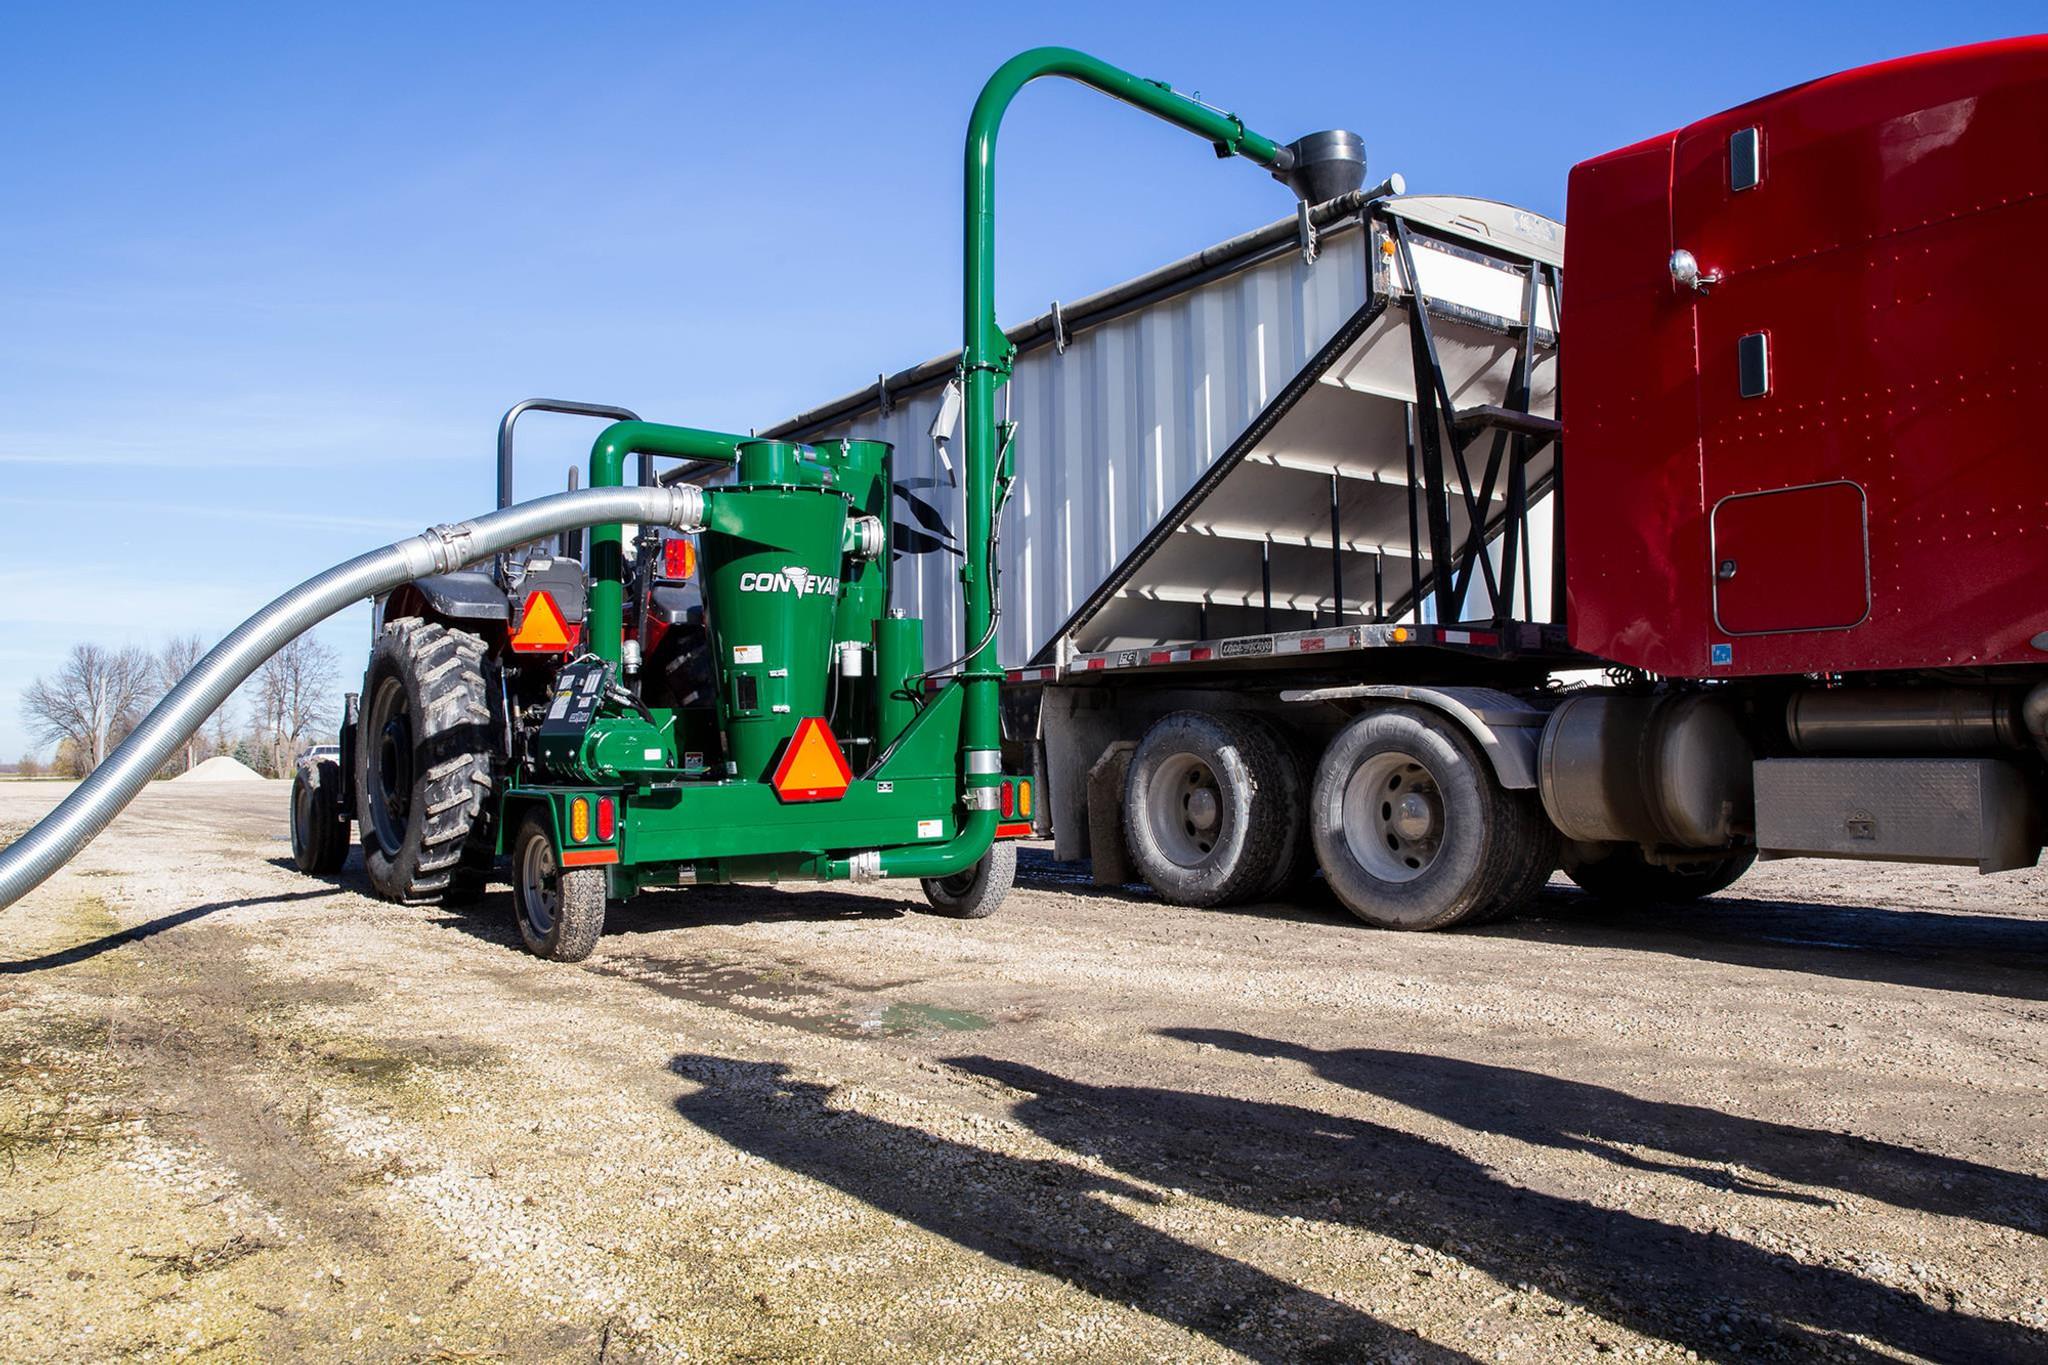 Conveyair | Grain Vac | Grain Handling